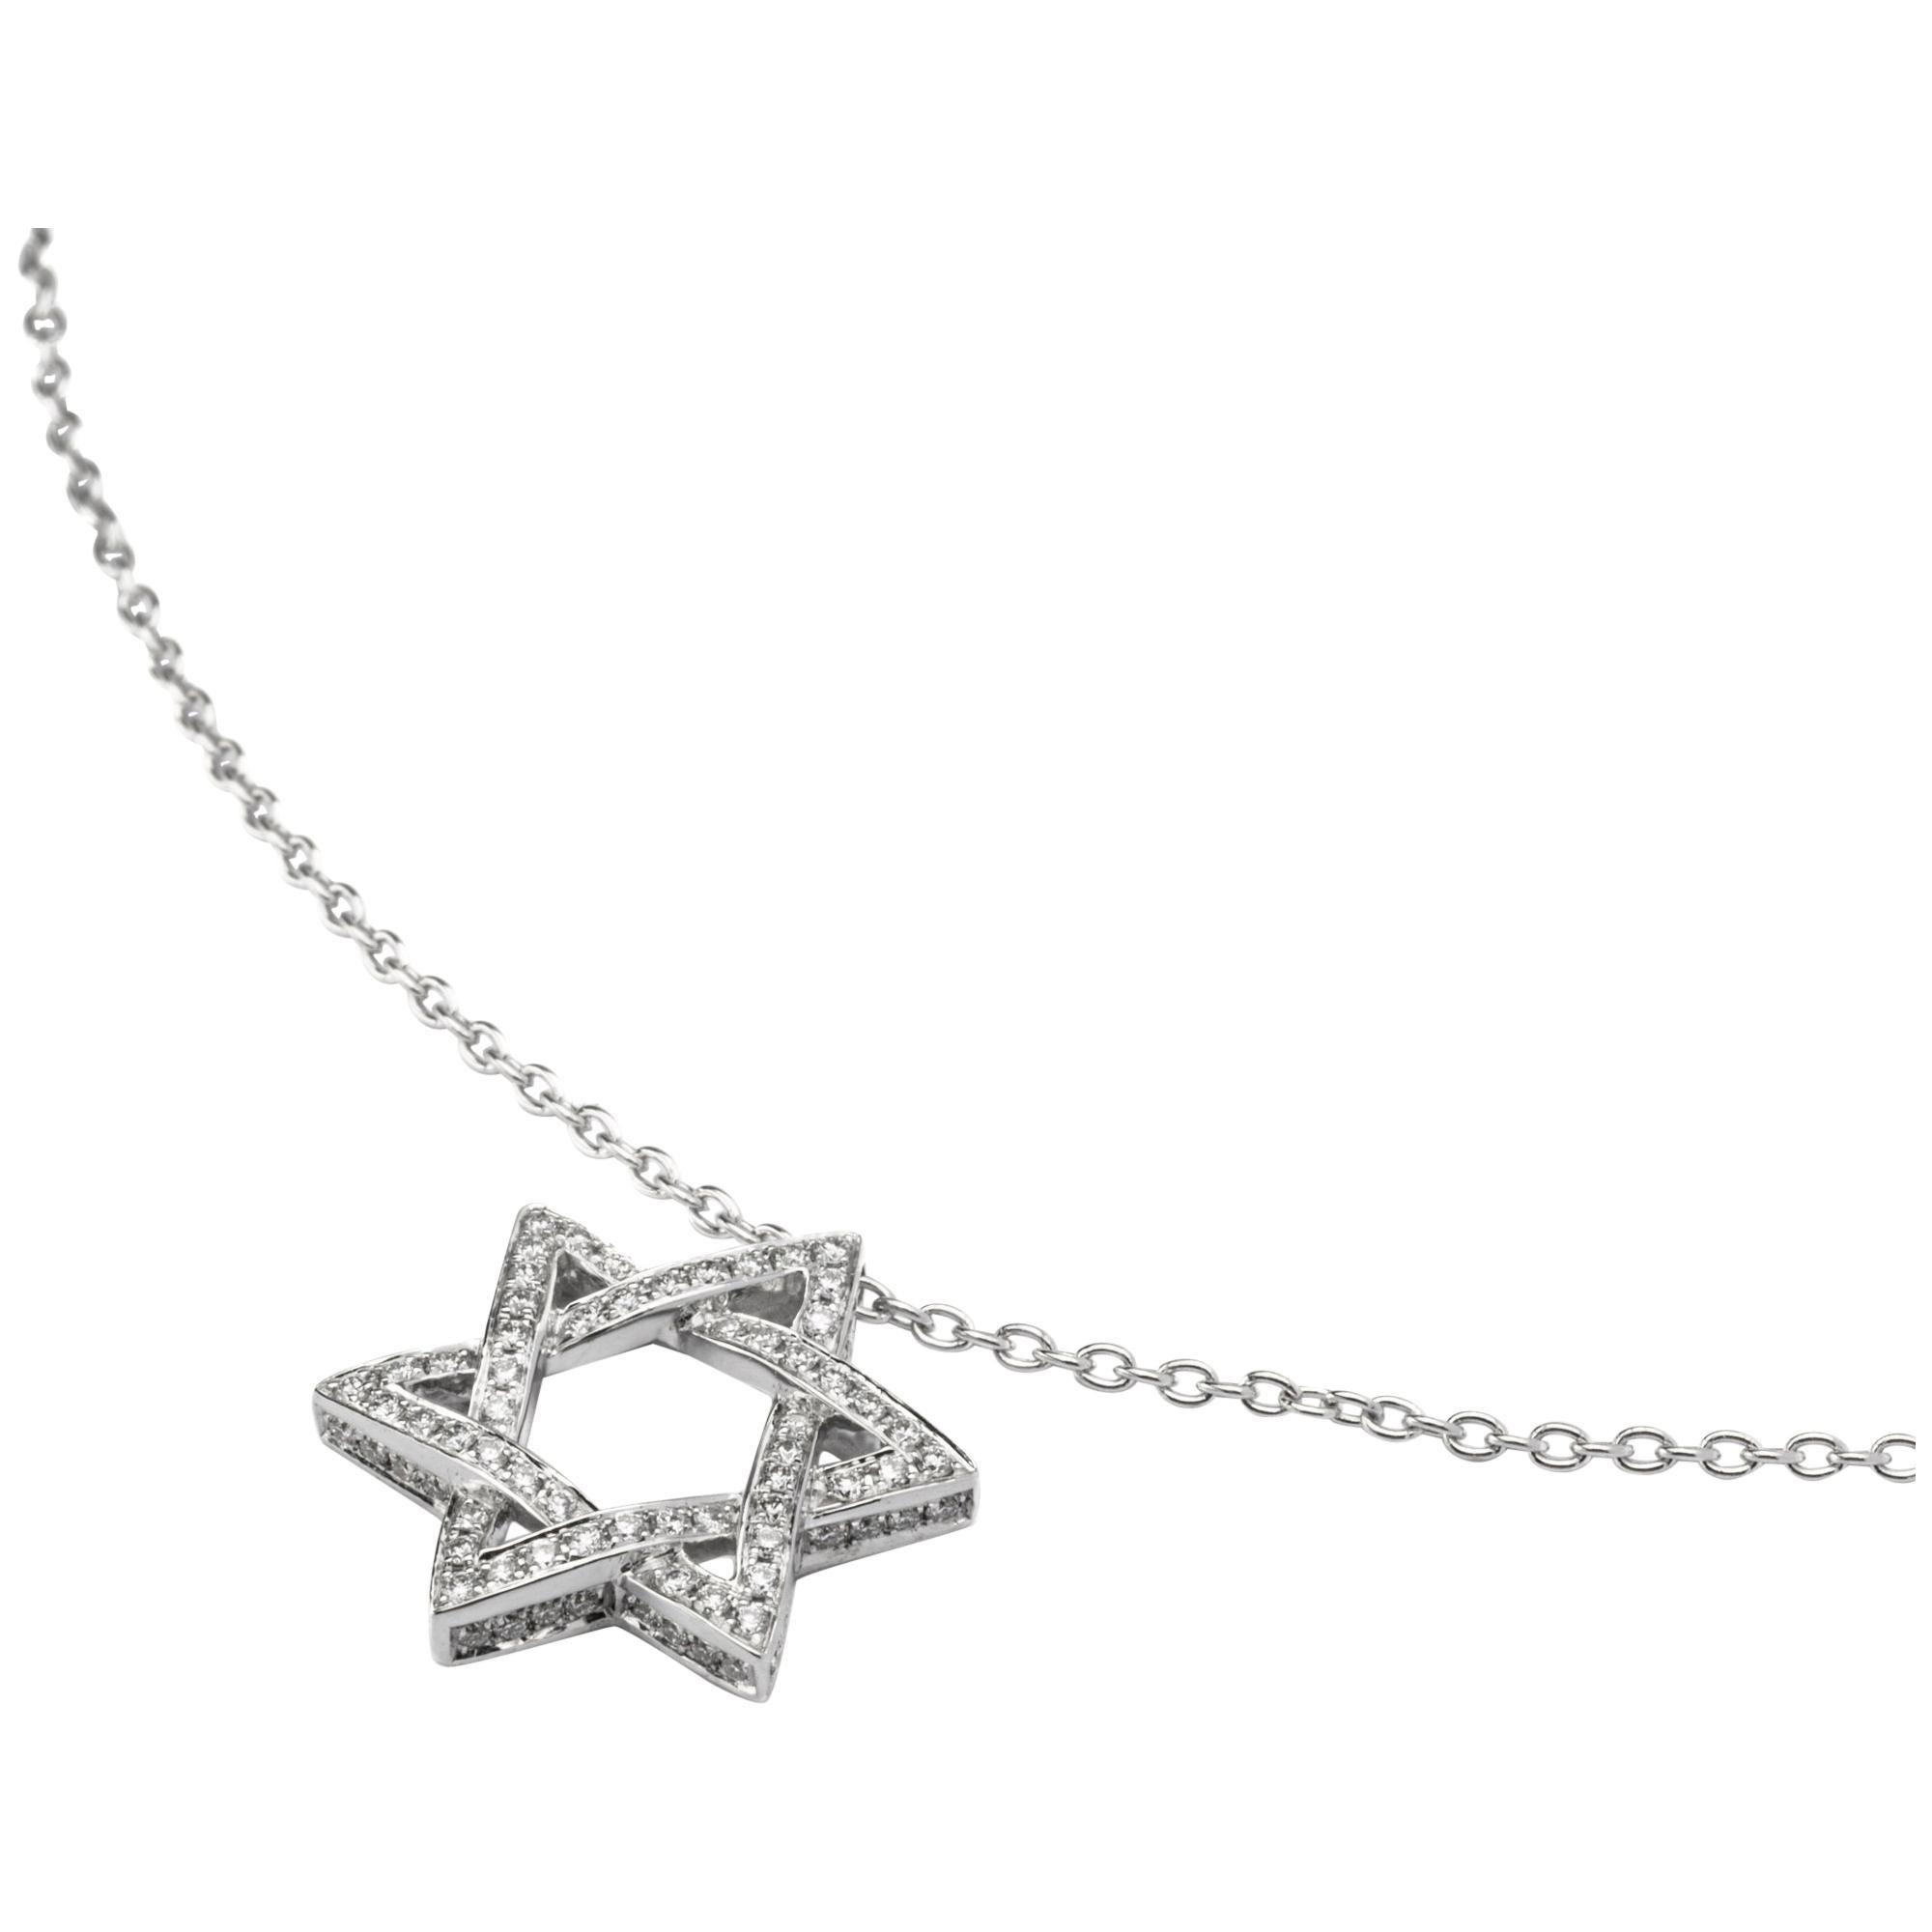 Jona White Diamond 18 Karat White Gold Star of David Pendant Necklace